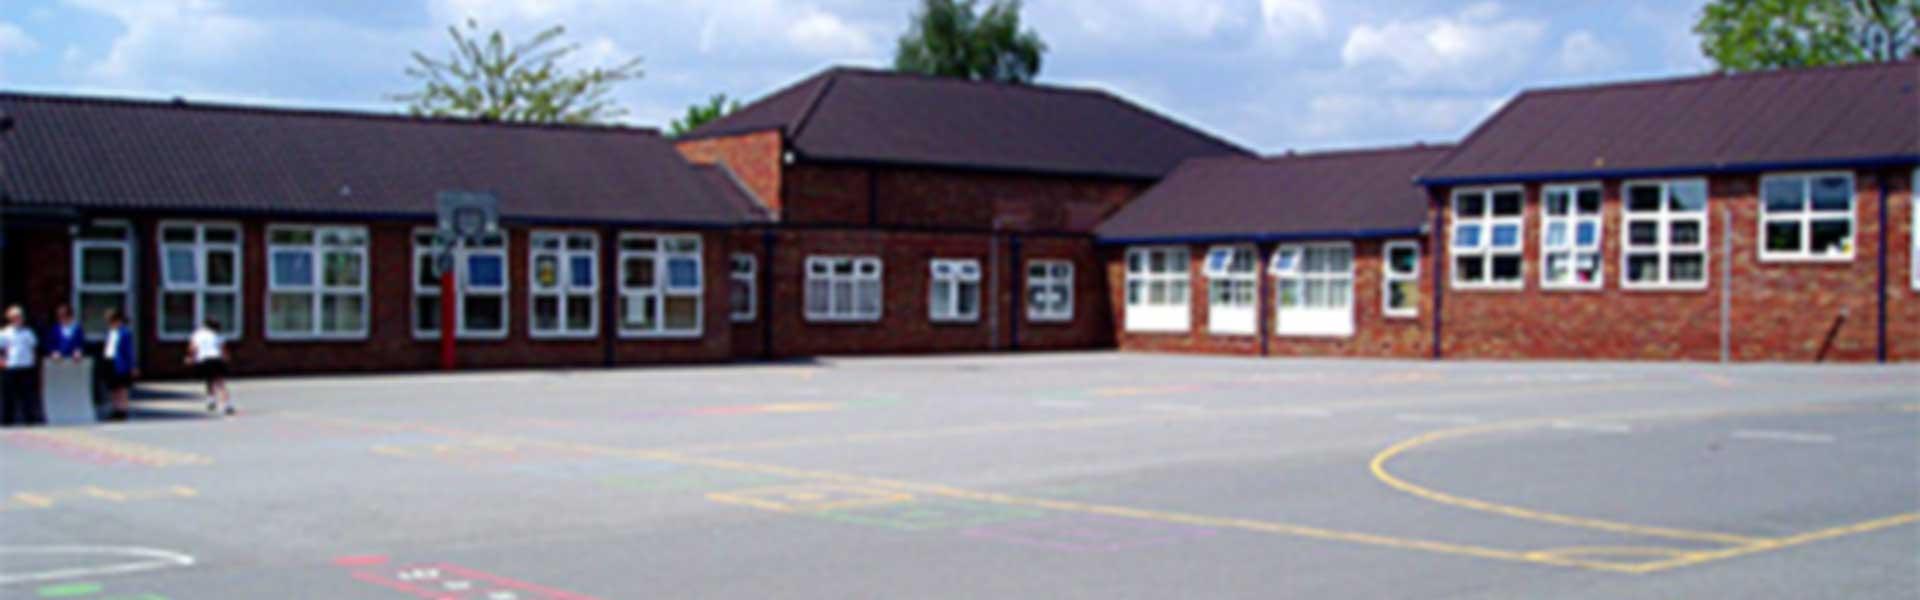 lightoaksjuniorschool.co.uk